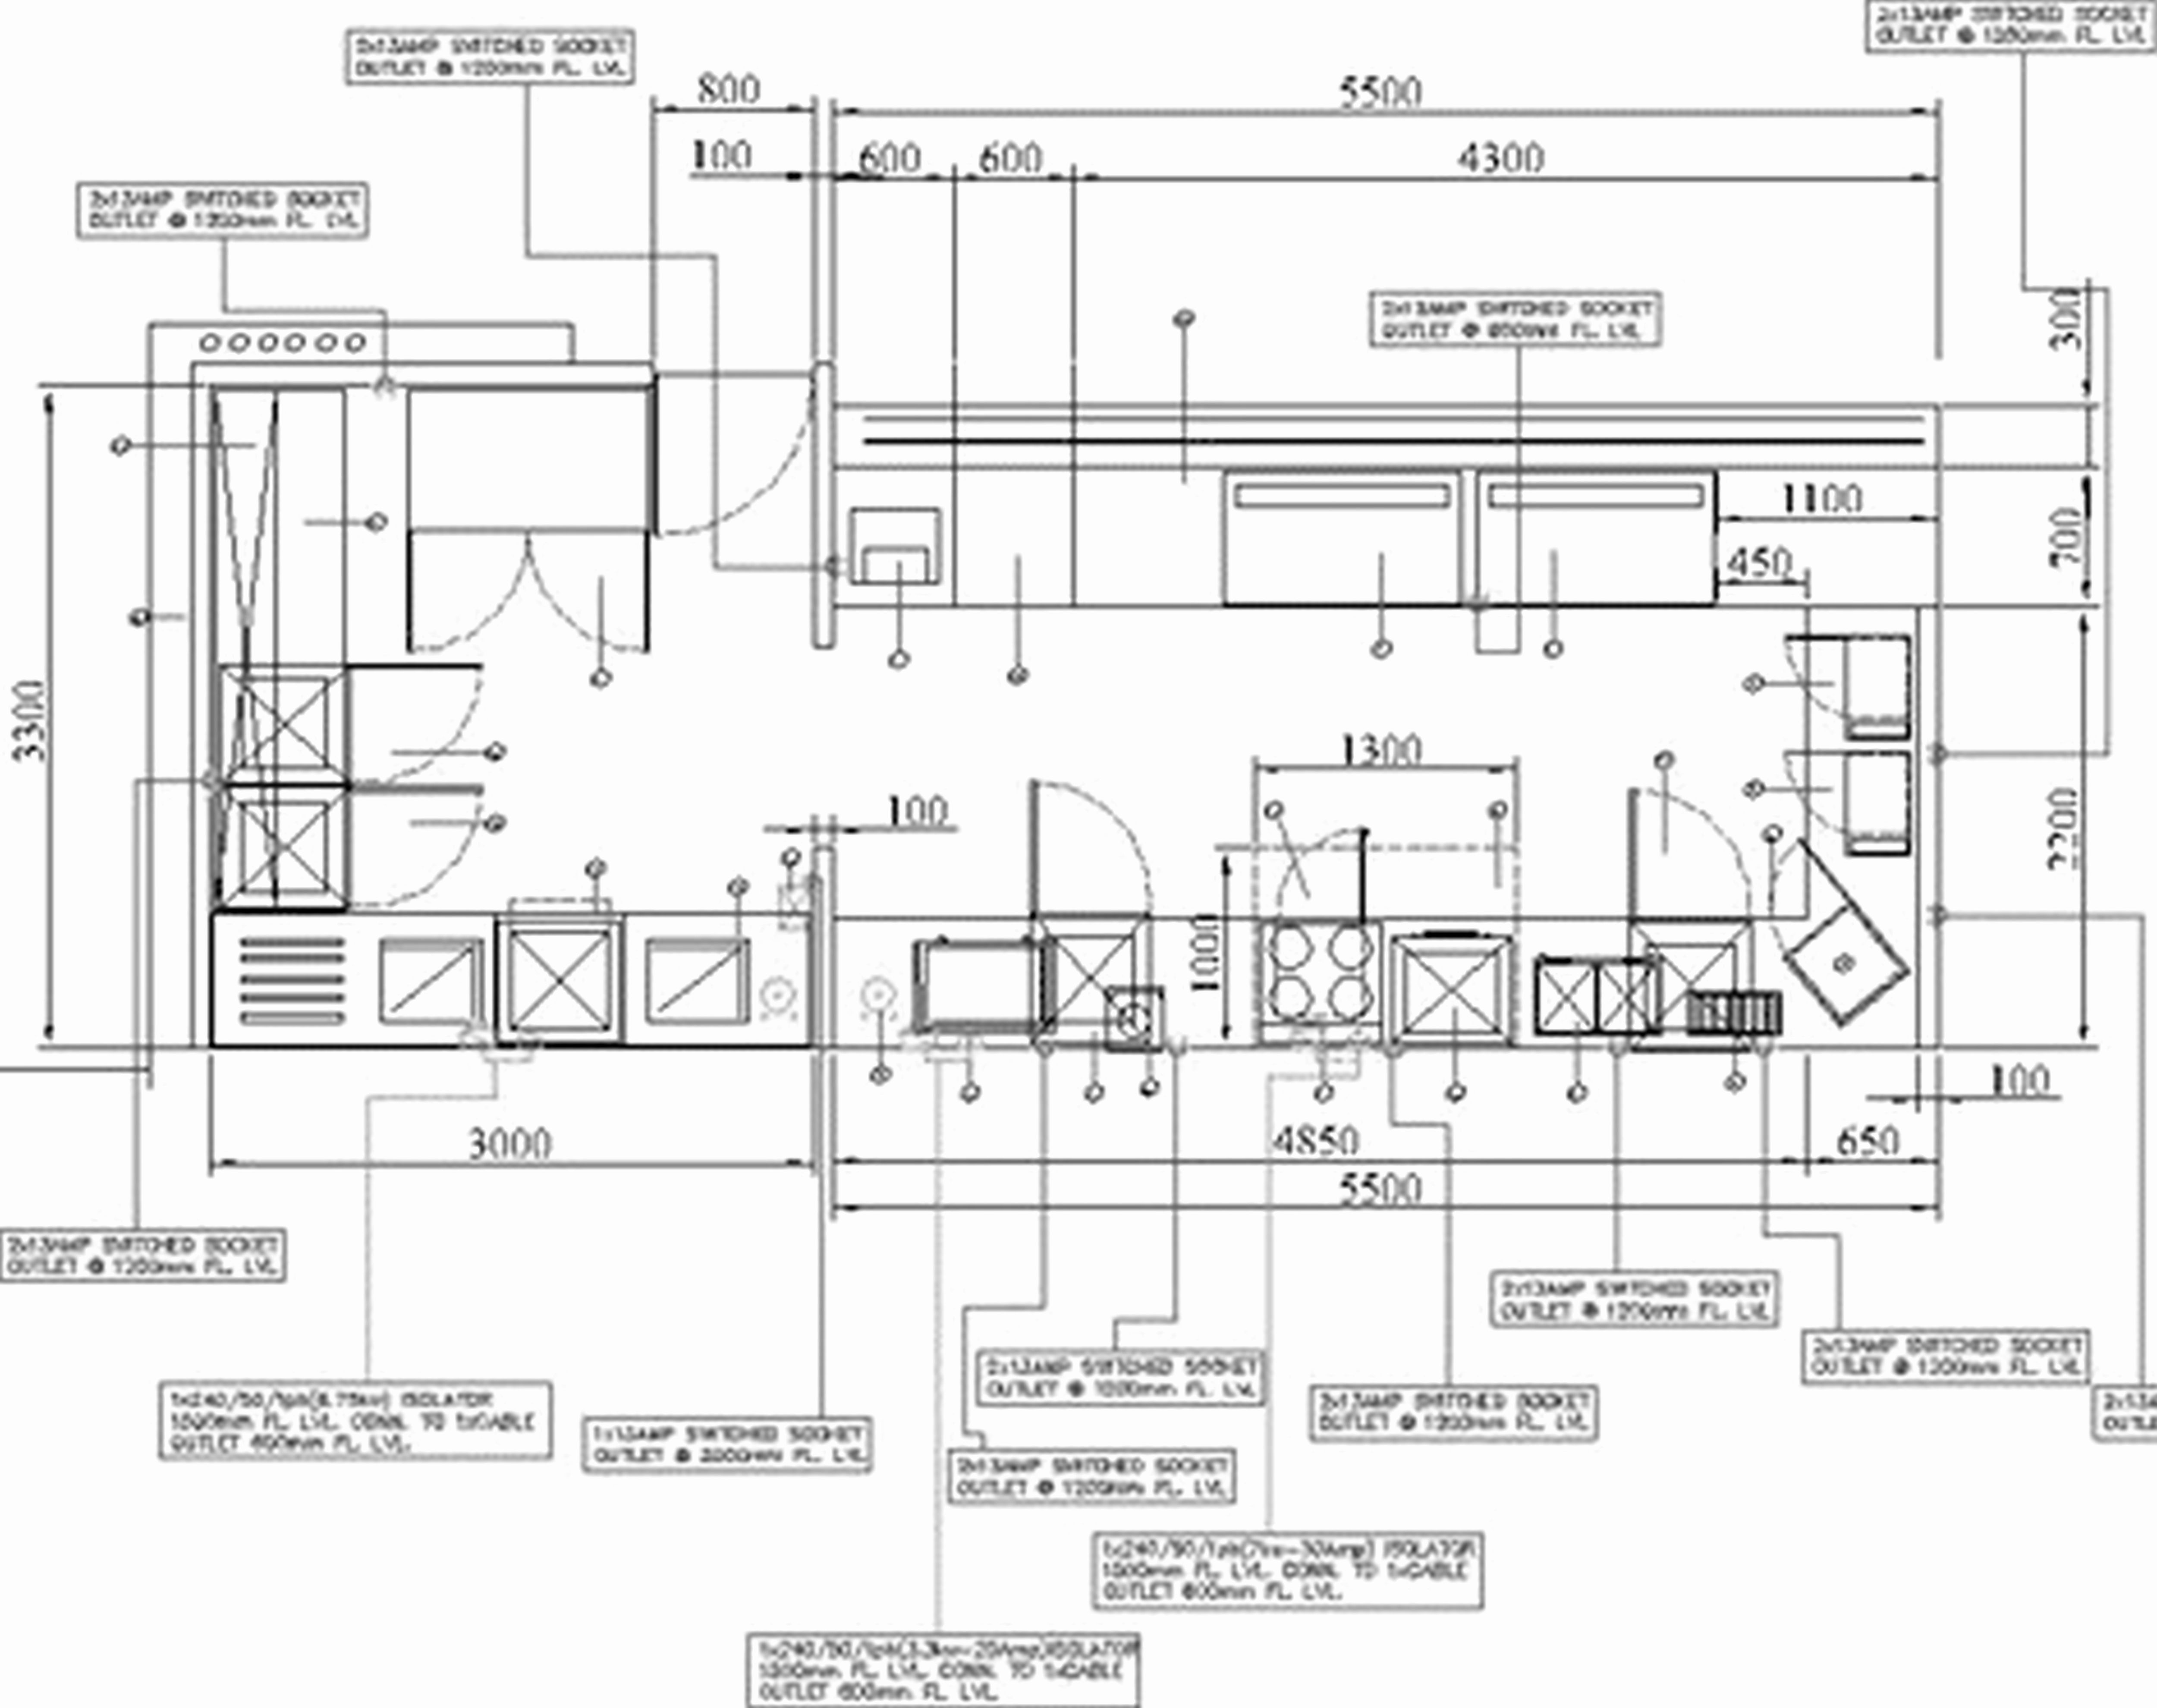 hight resolution of restaurant floor plans with dimensions kitchen commercial kitchen design layouts modern floor plan